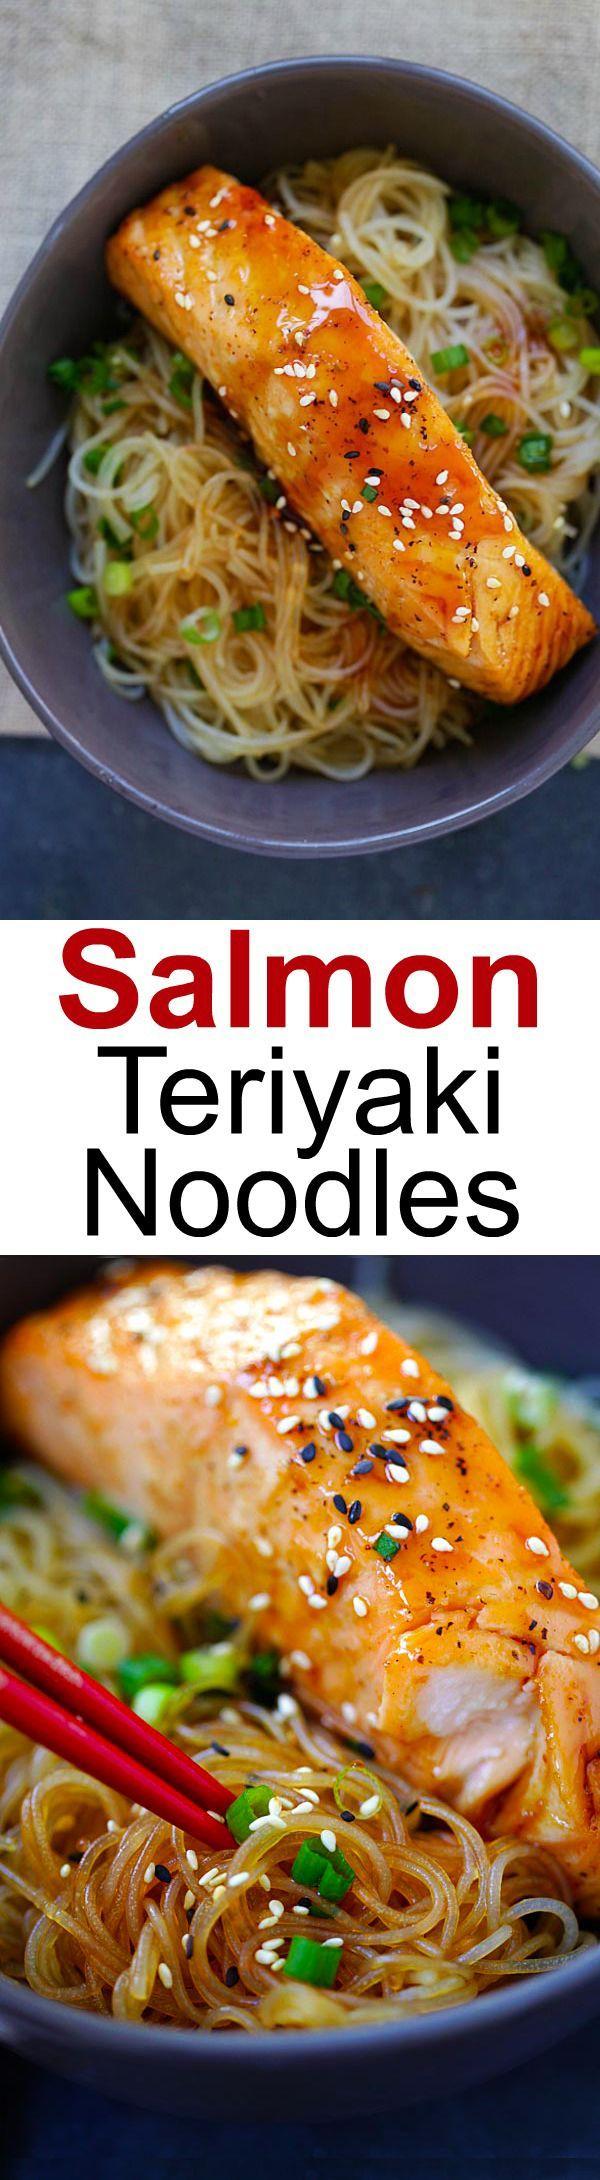 Salmon Teriyaki Noodles Recipe by Rasa Malaysia. Moist and juicy salmon and rice noodles made with San-J Tamari. http://rasamalaysia.com/salmon-teriyaki-noodles/2/